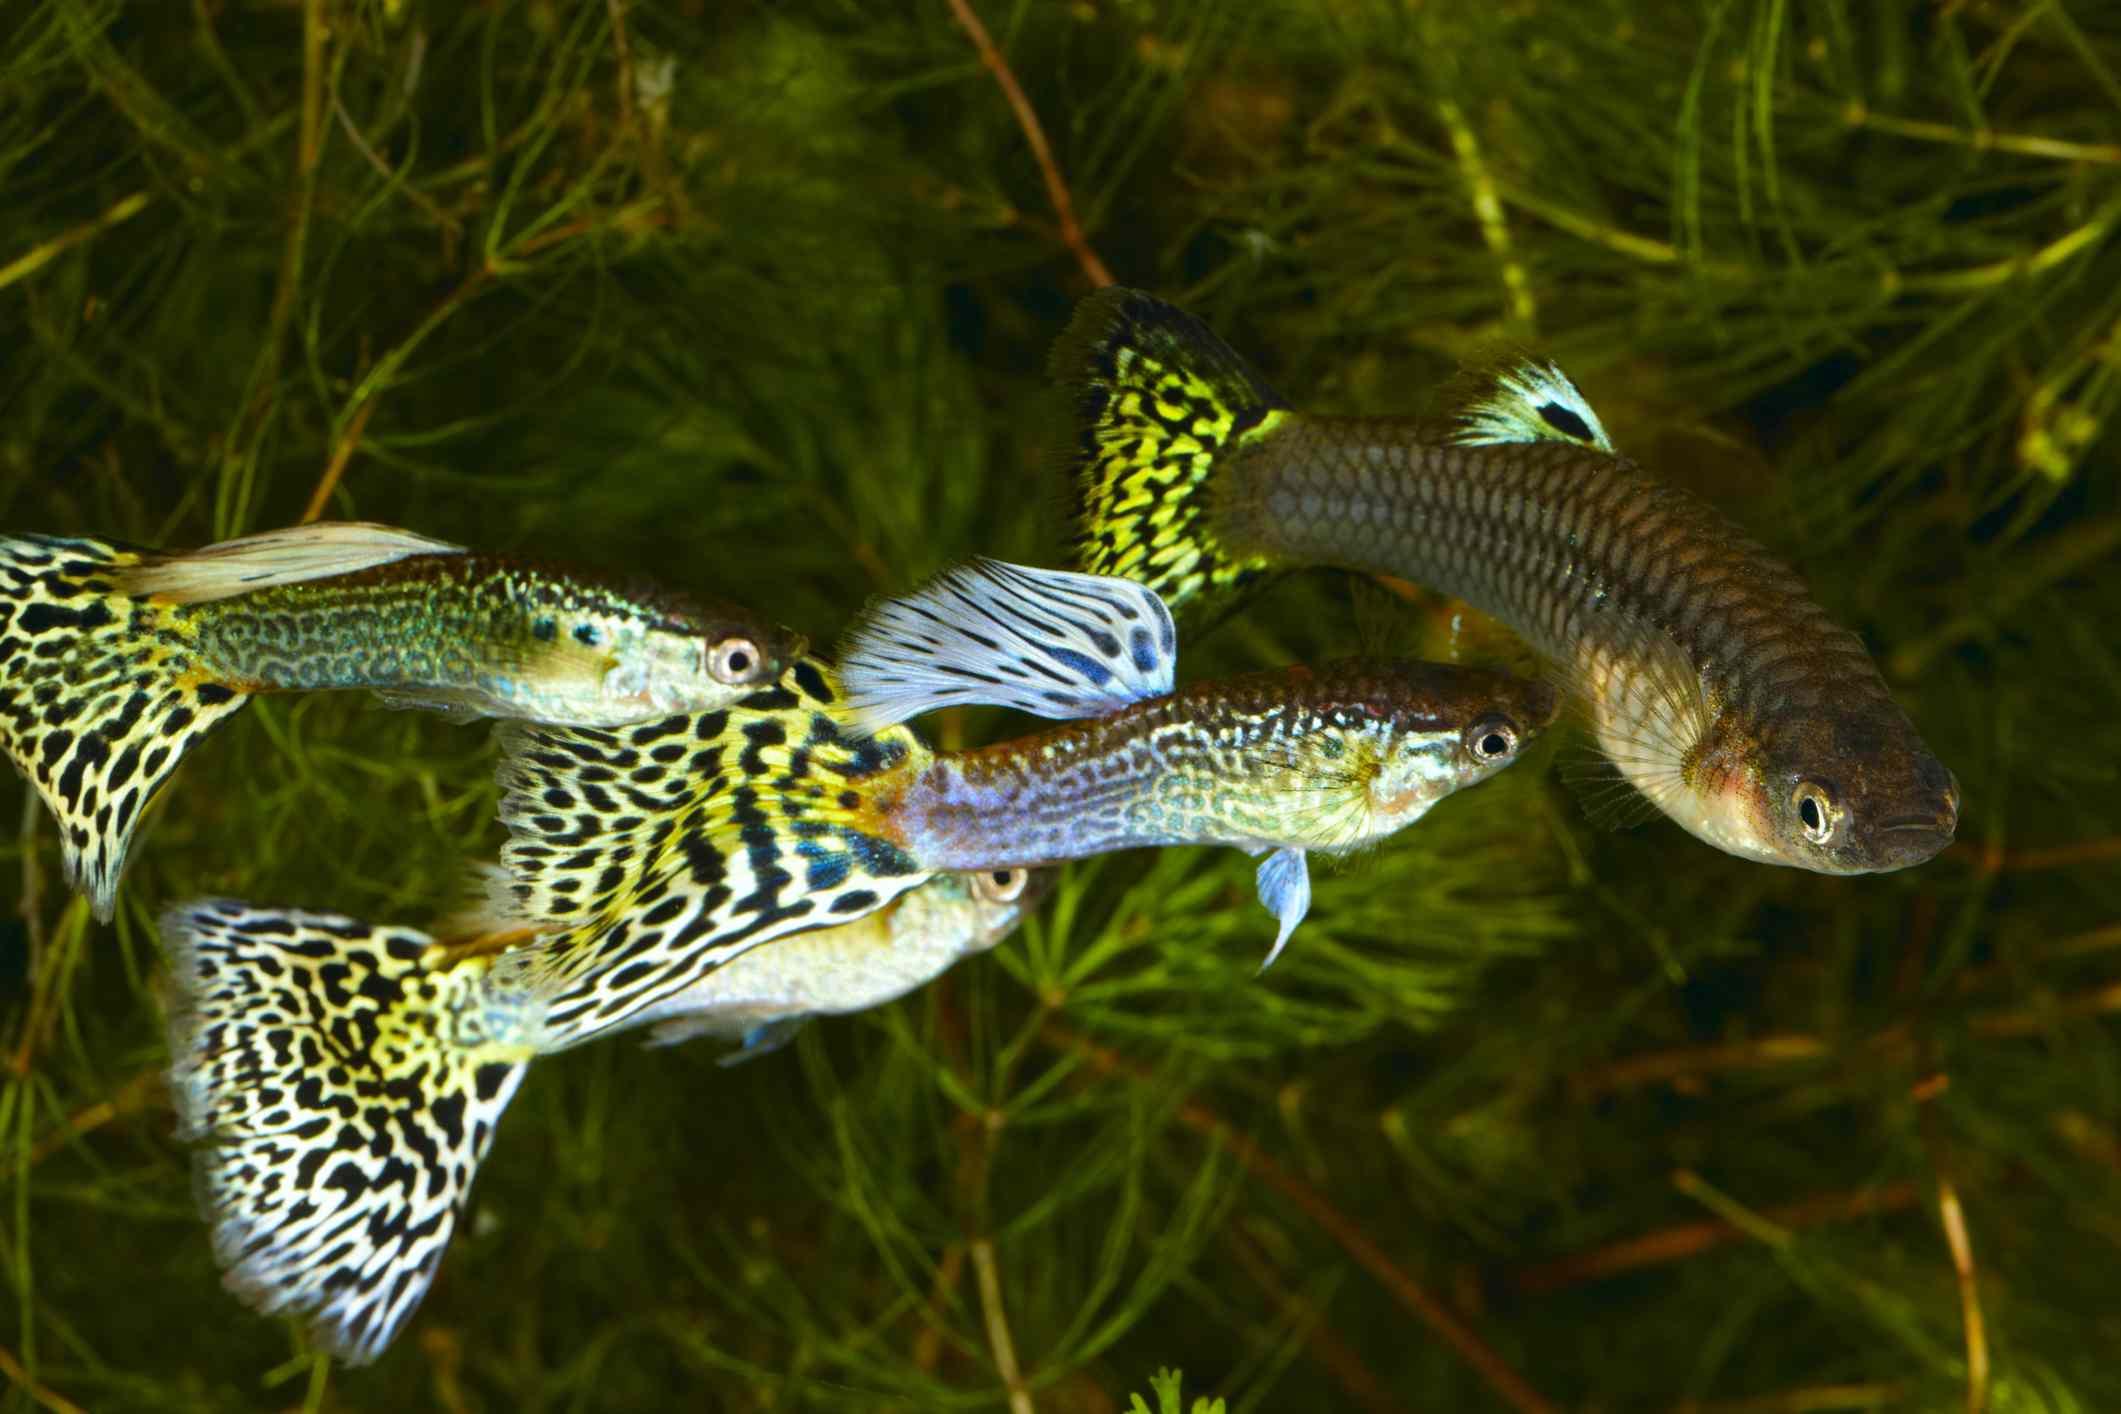 Three male and one female guppy fish